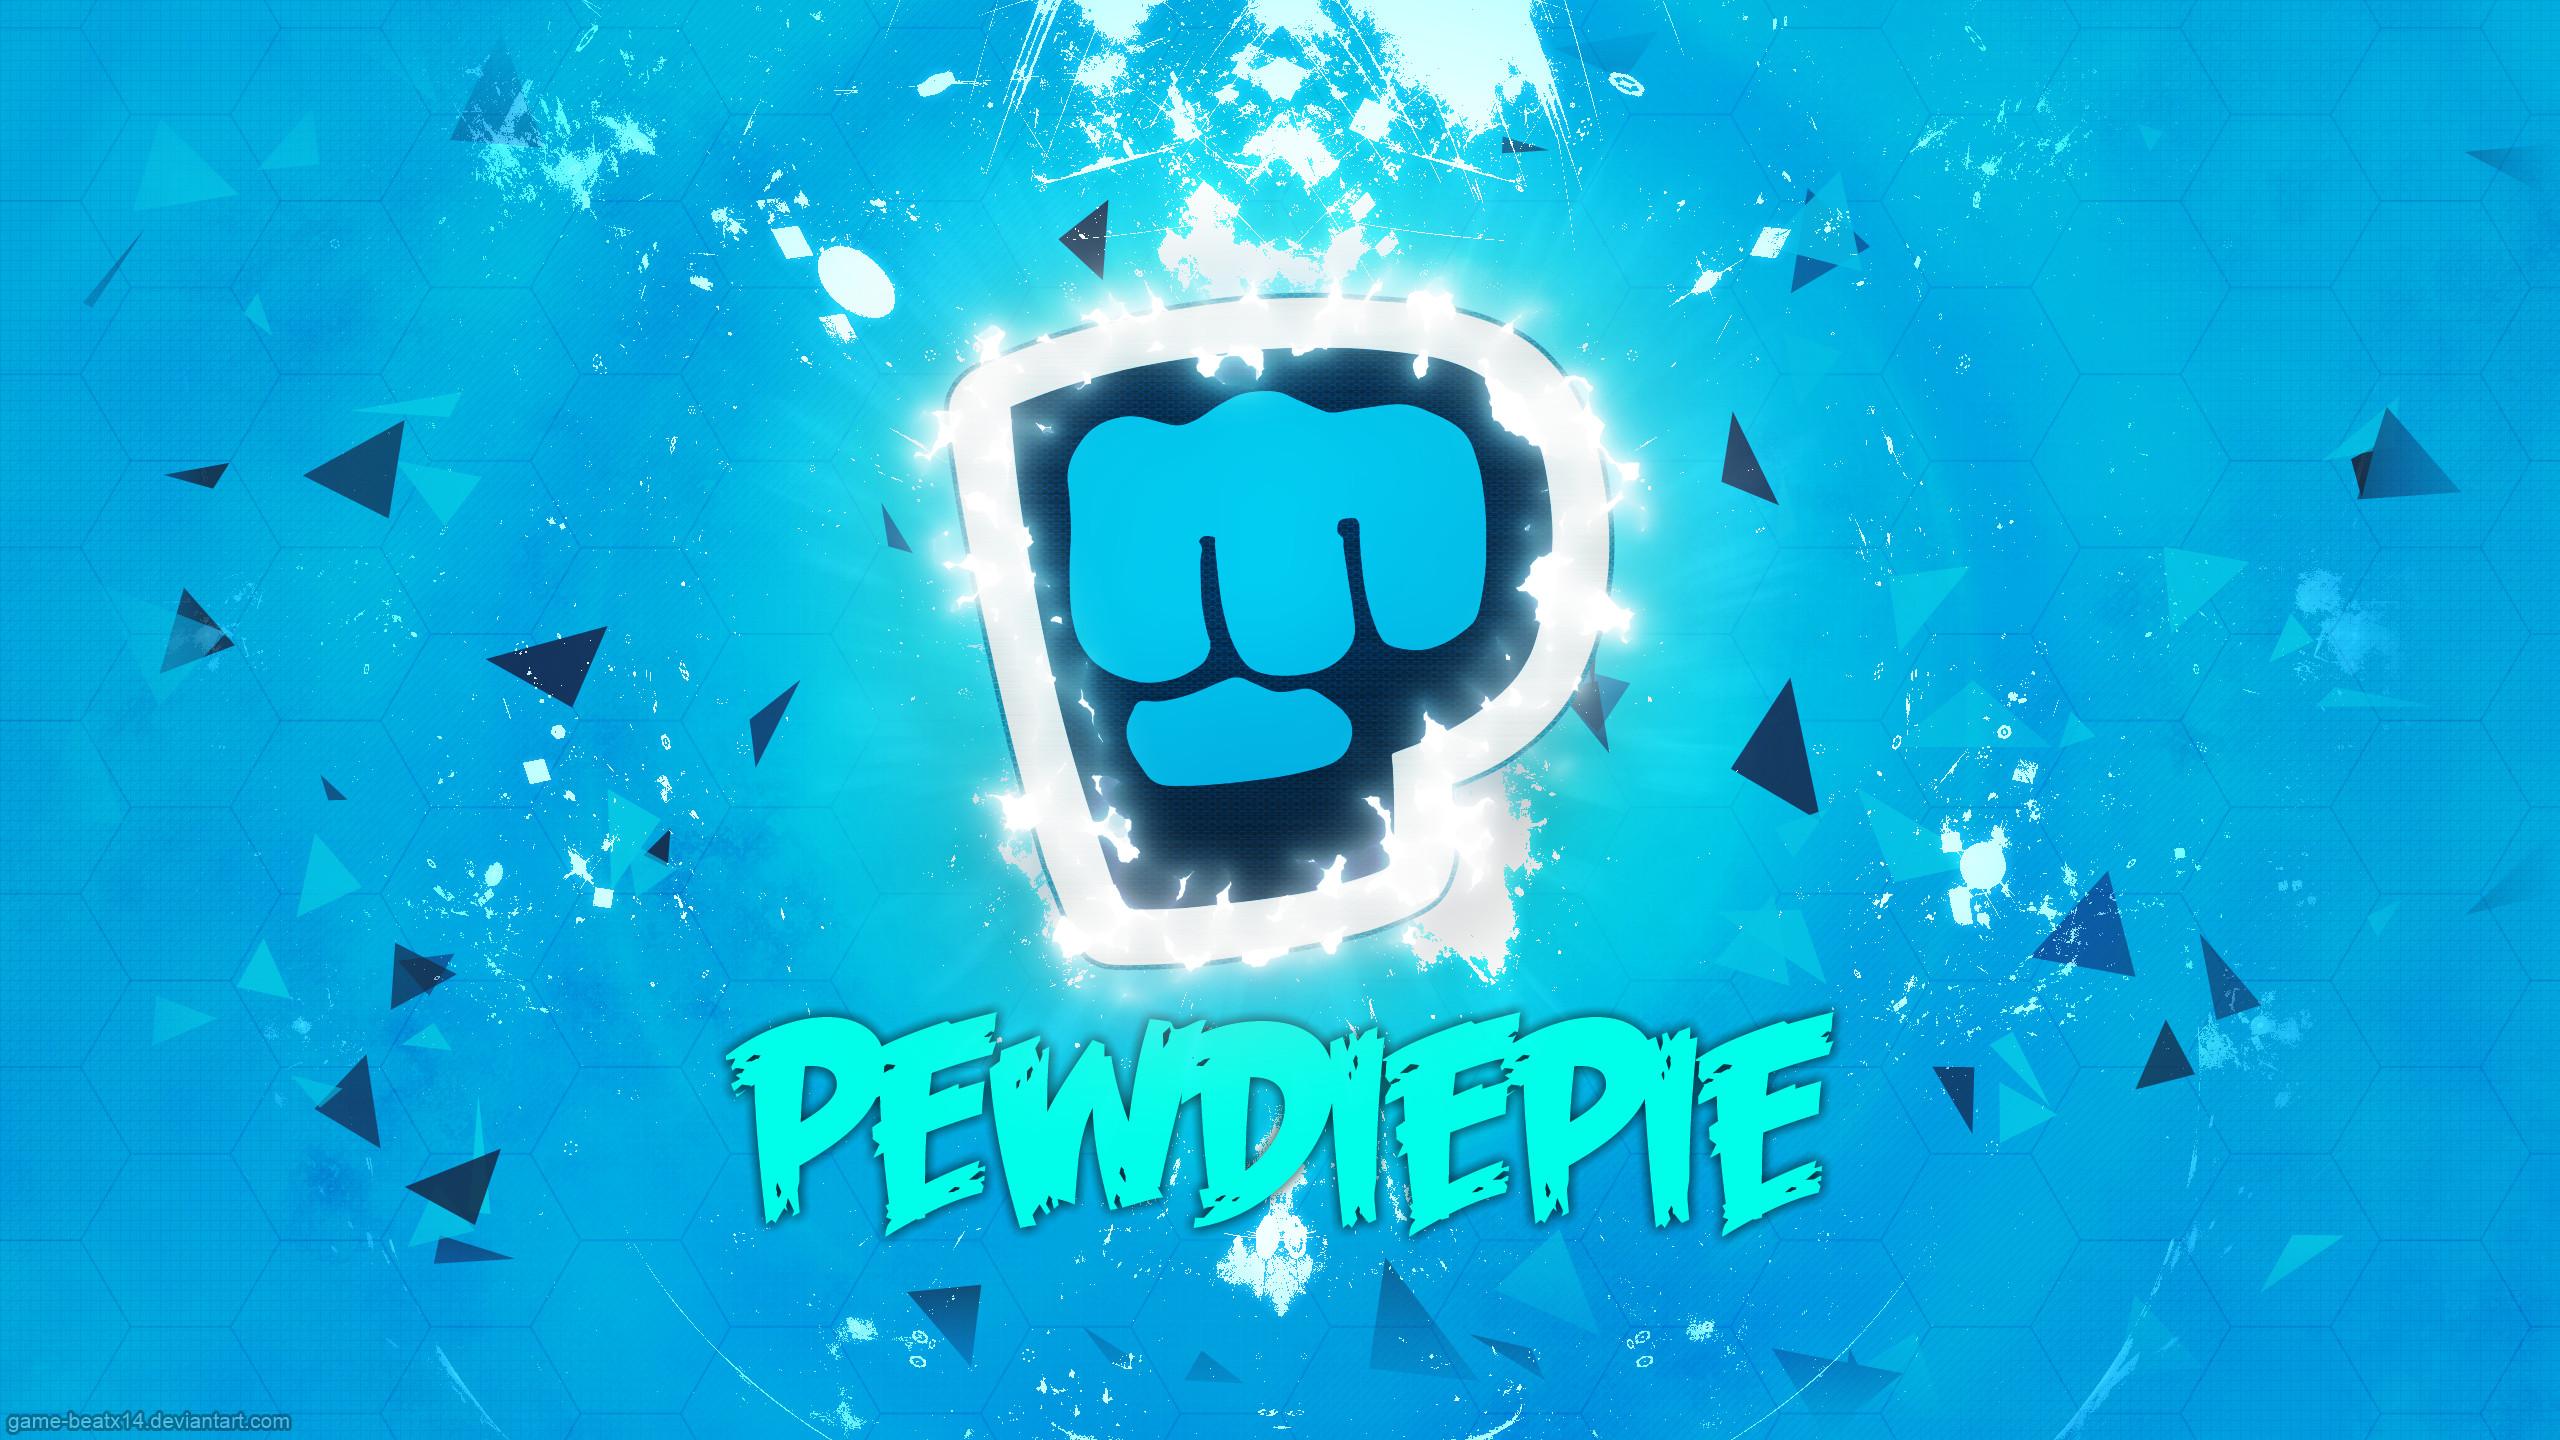 PewDiePie Wallpaper